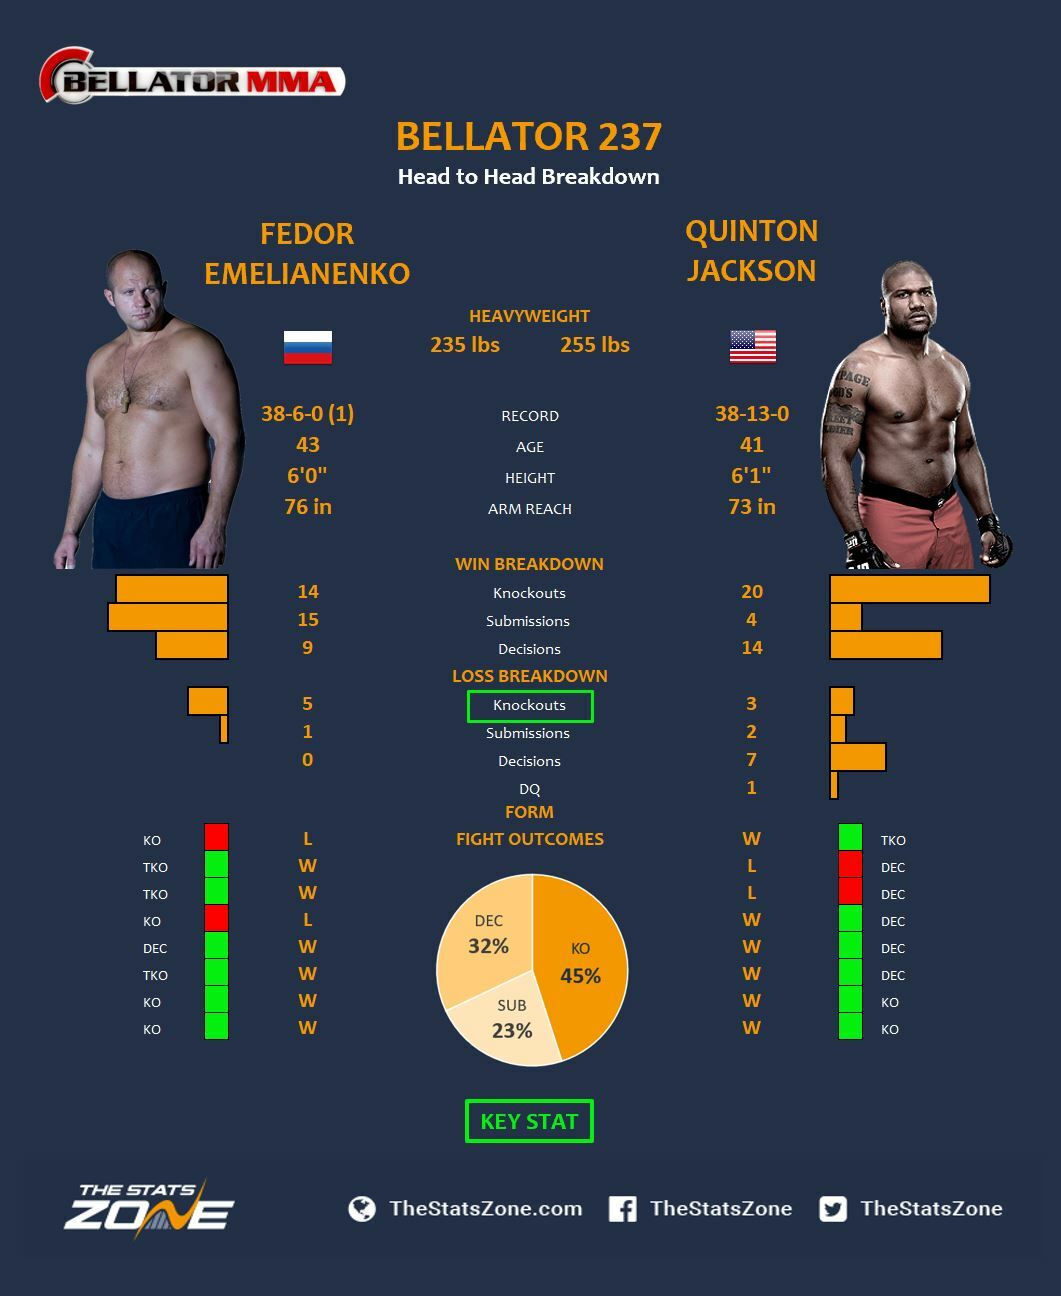 Mma Preview Fedor Emelianenko Vs Quinton Jackson At Bellator 237